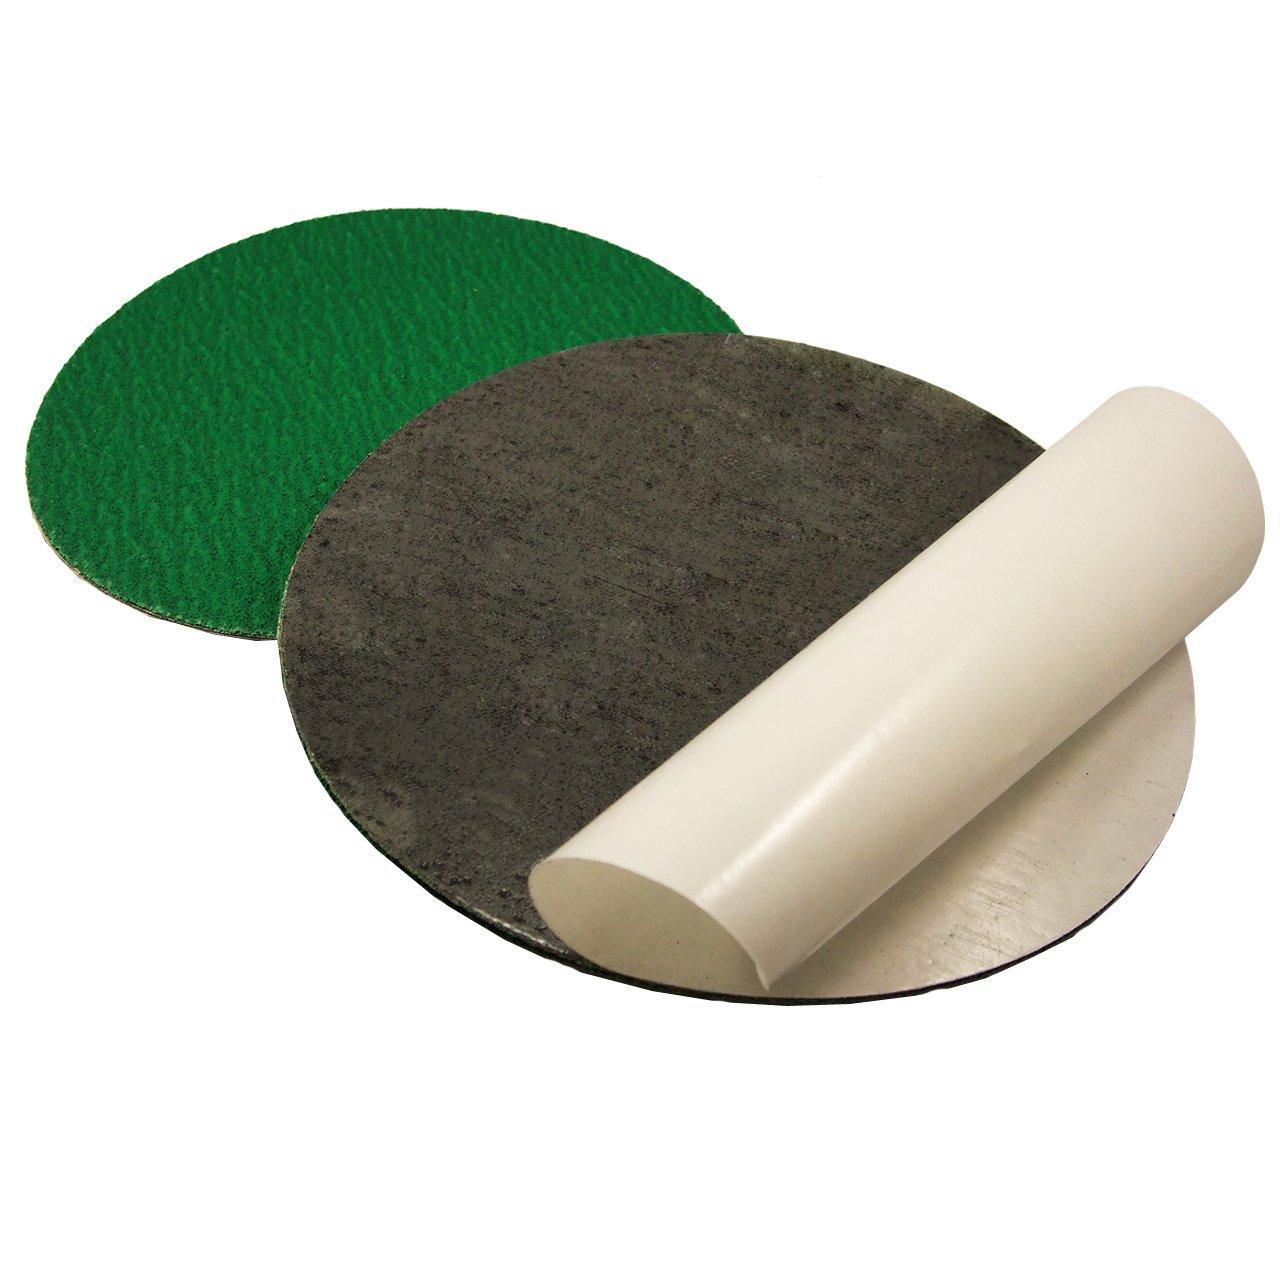 20 Inch 24 Grit Adhesive Back Metal Grinding Zirconia Sanding Disc